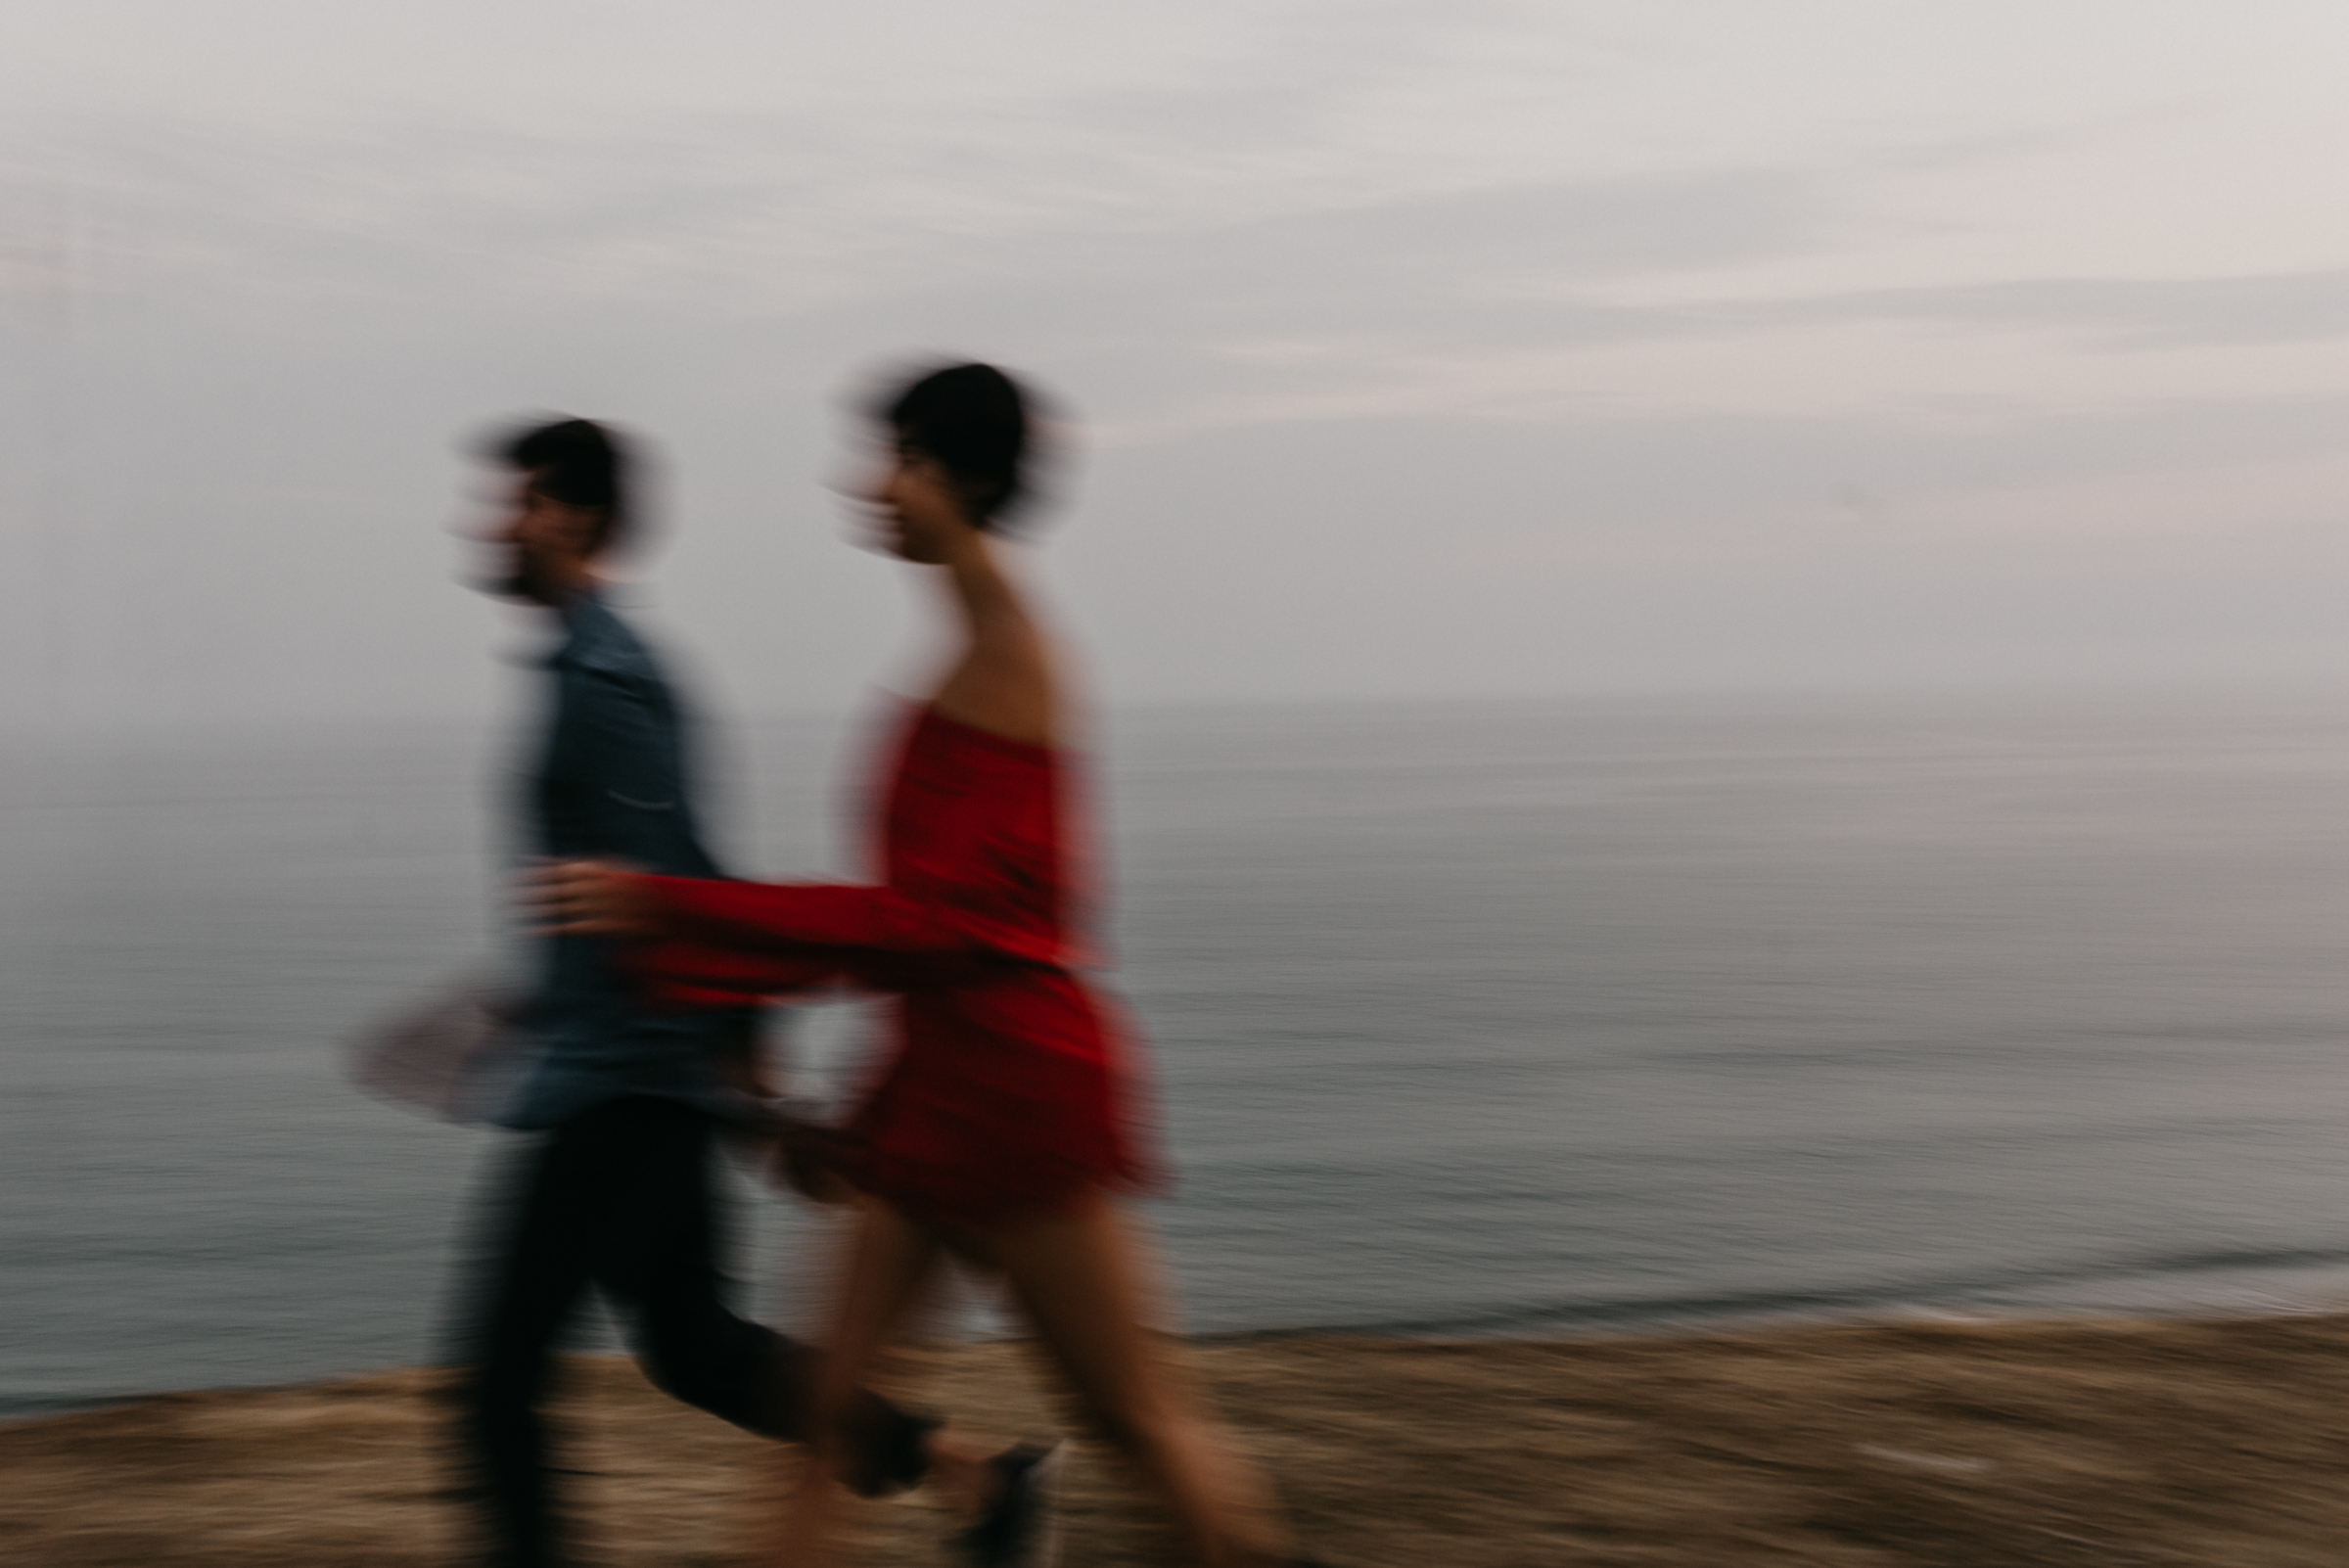 Isaiah + Taylor Photography - Santa Monica Engagement Session, Los Angeles Wedding Photographer-053.jpg